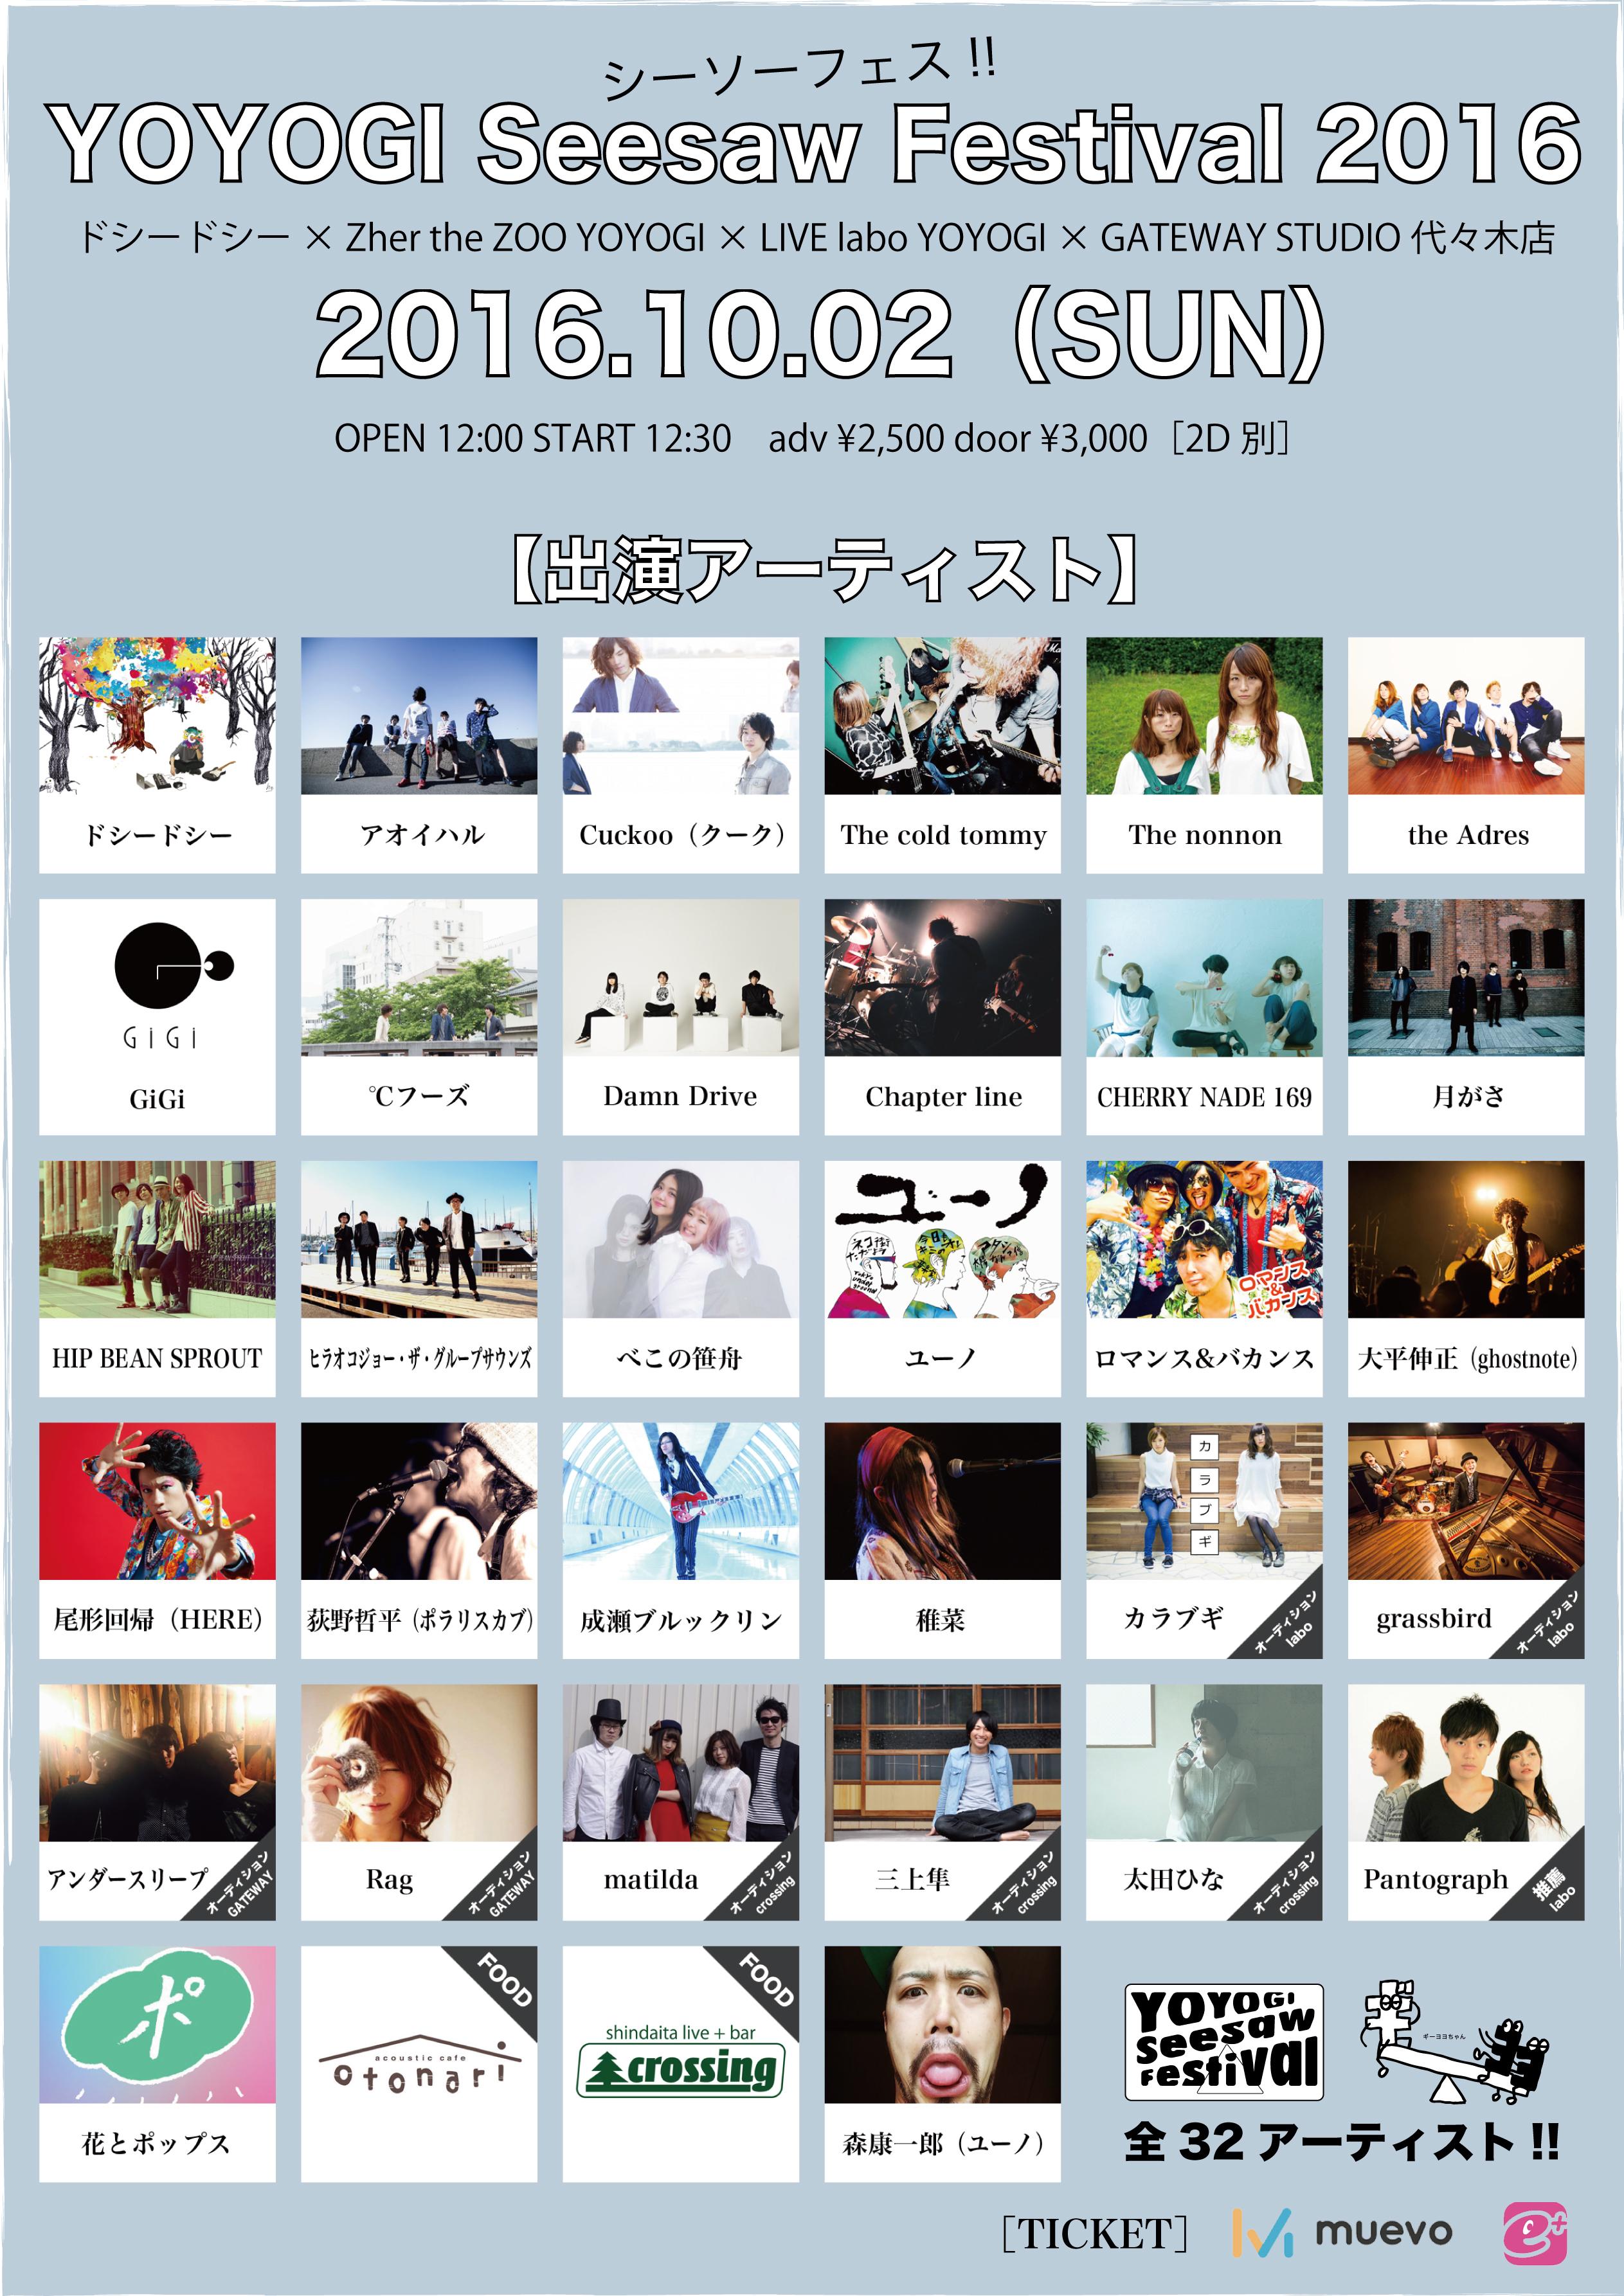 YOYOGI Seesaw Festival チケットプラン